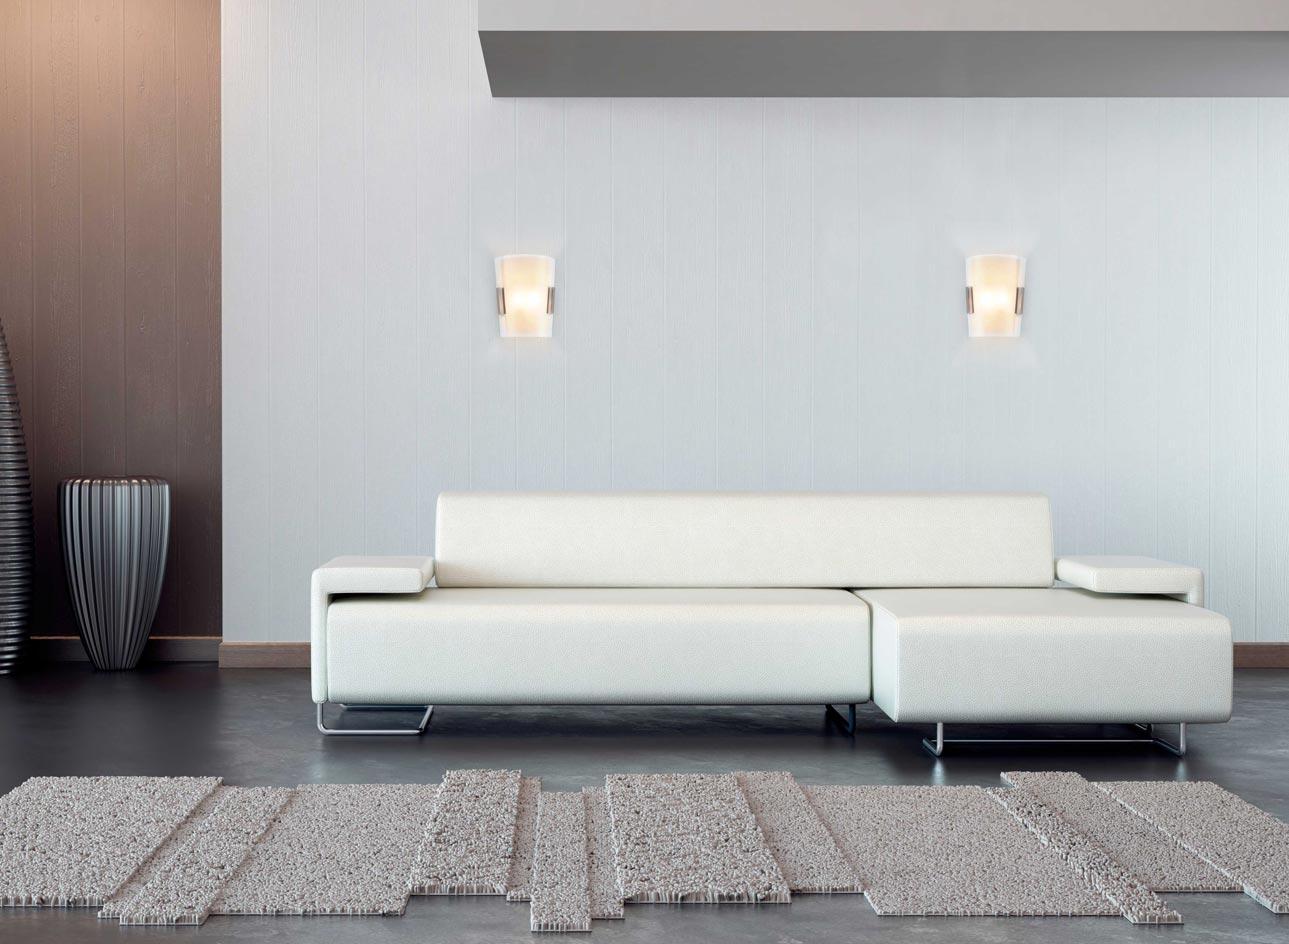 Lámpara aplique níquel mate TWIN-3 ambiente